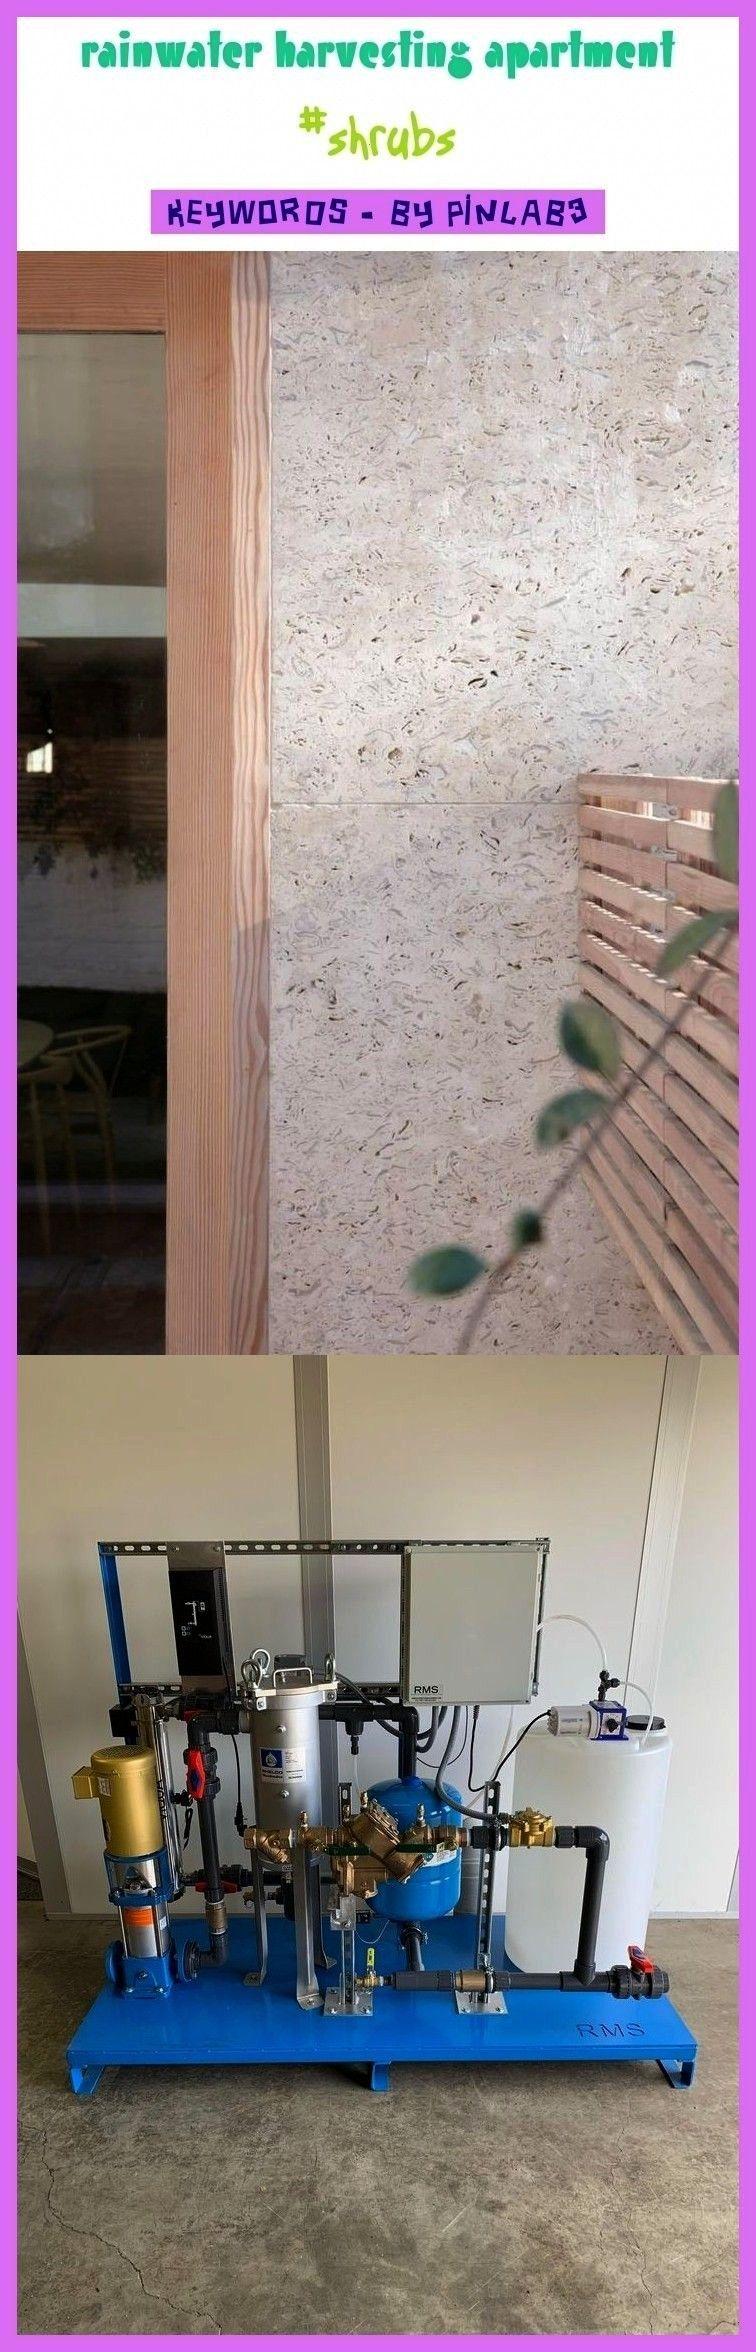 harvesting apartment rainwater harvesting architecture rainwater harvesting diy rainwater harvesting system rainwater harvesting infographic rainwater harvesting design r...